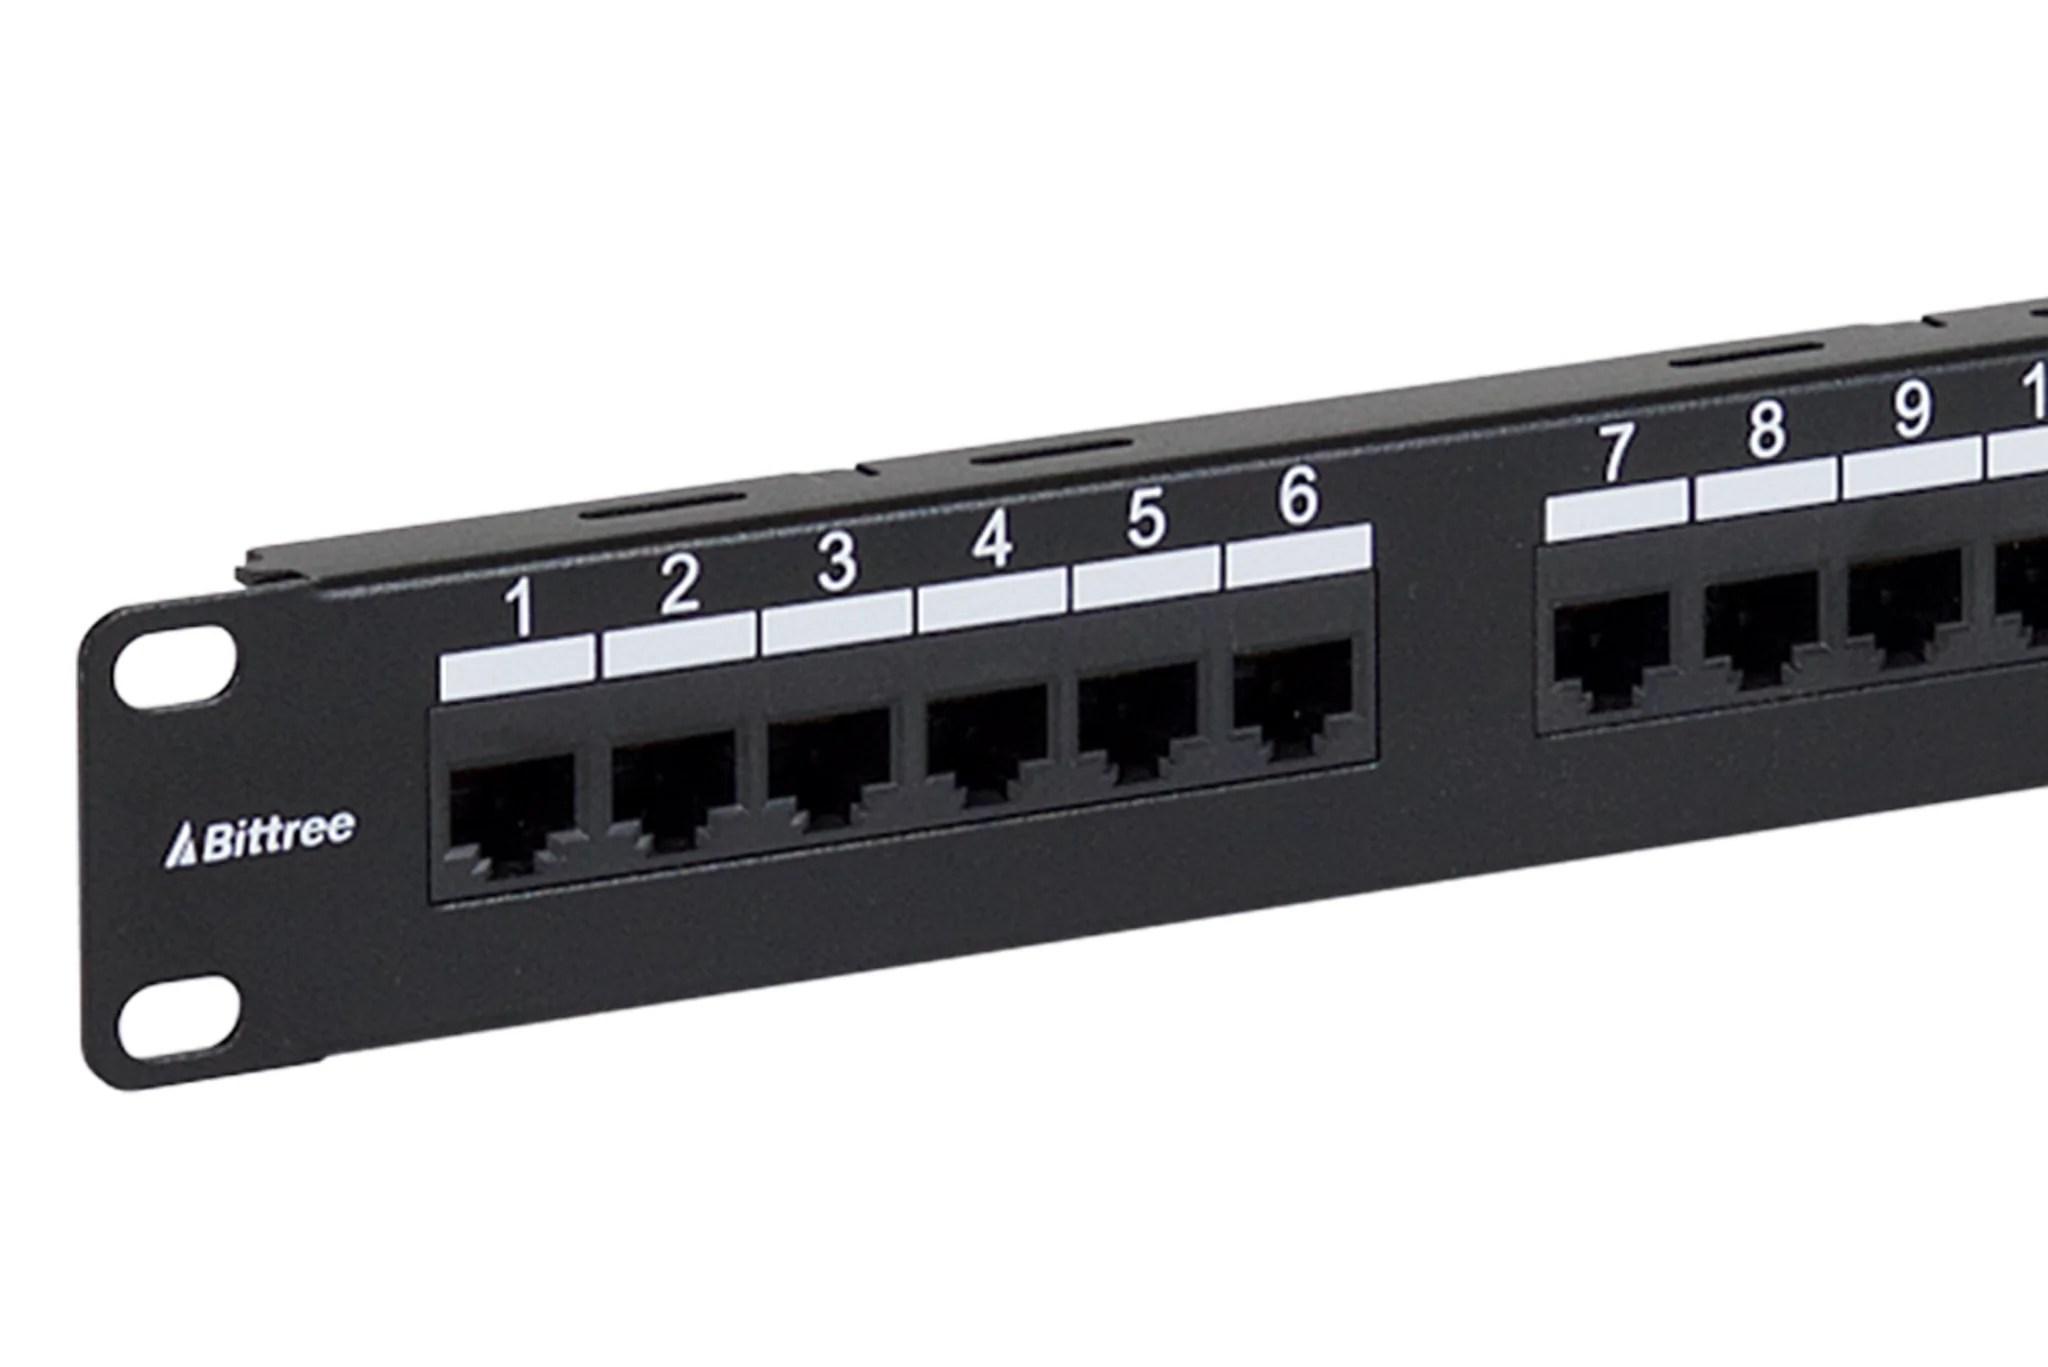 small resolution of  flush mount gigabit ethernet panel cat 6 110 punchdown unshielded 1x24